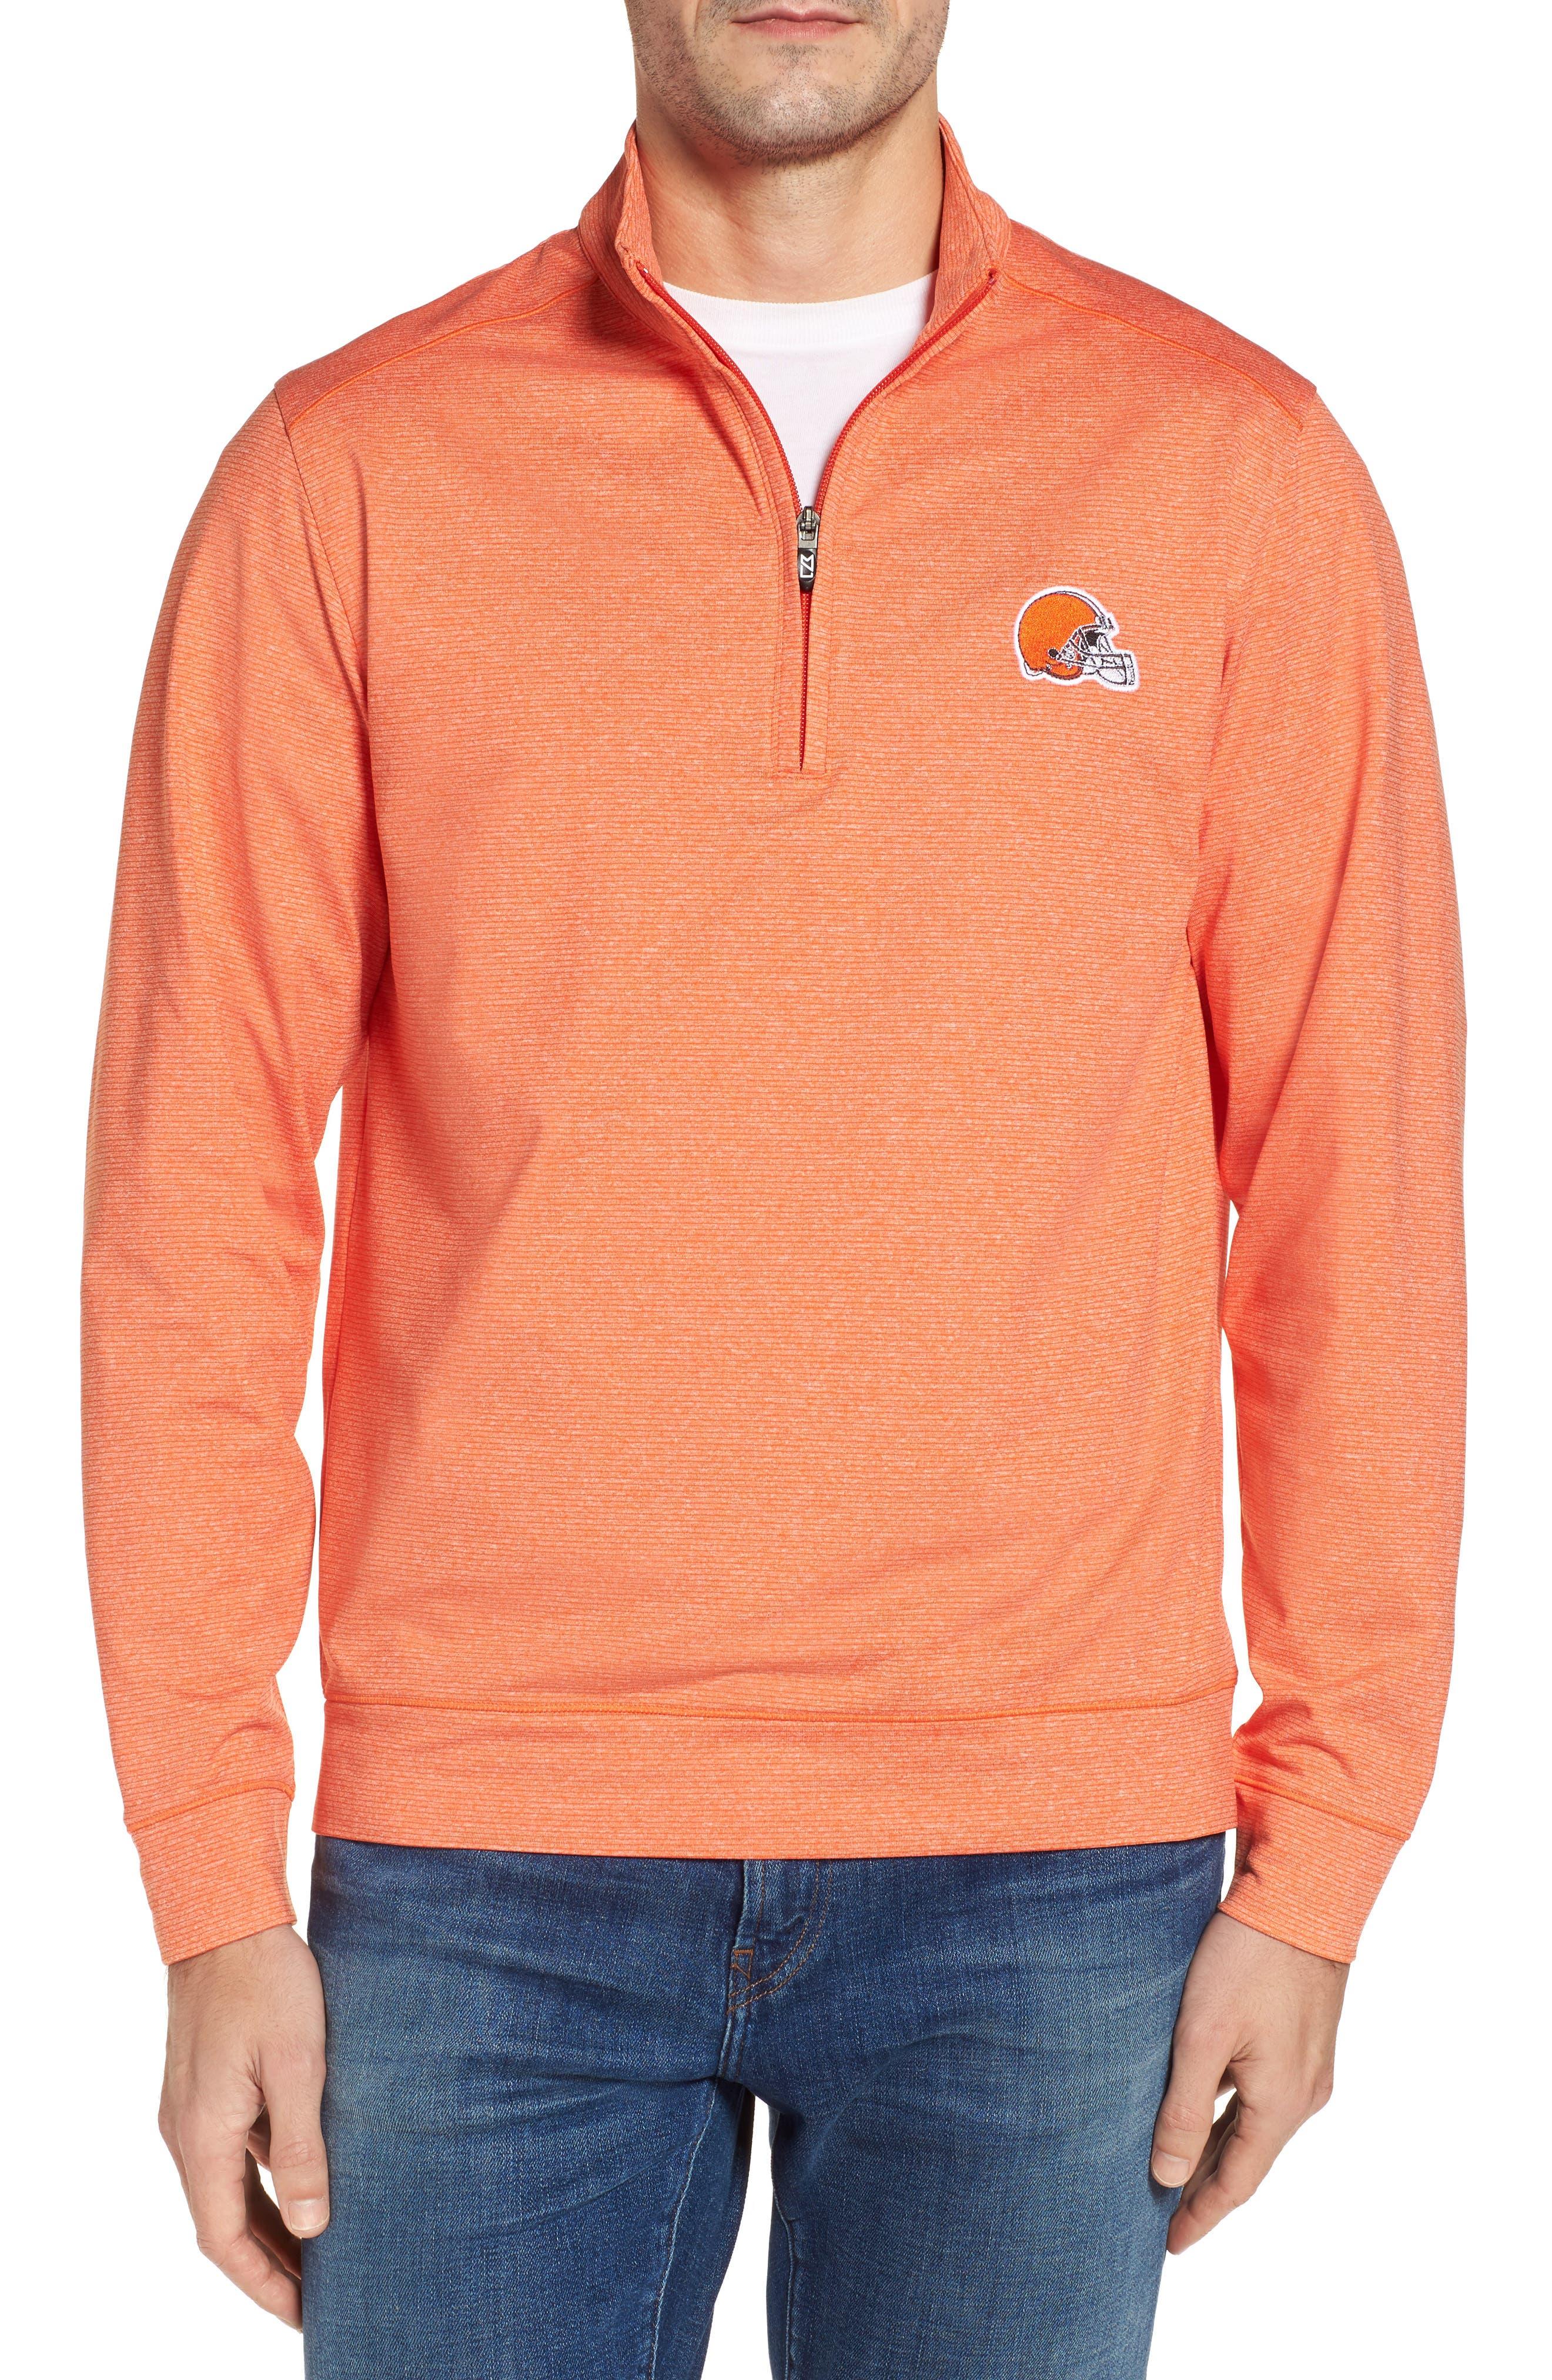 Shoreline - Cleveland Browns Half Zip Pullover,                         Main,                         color, College Orange Heather